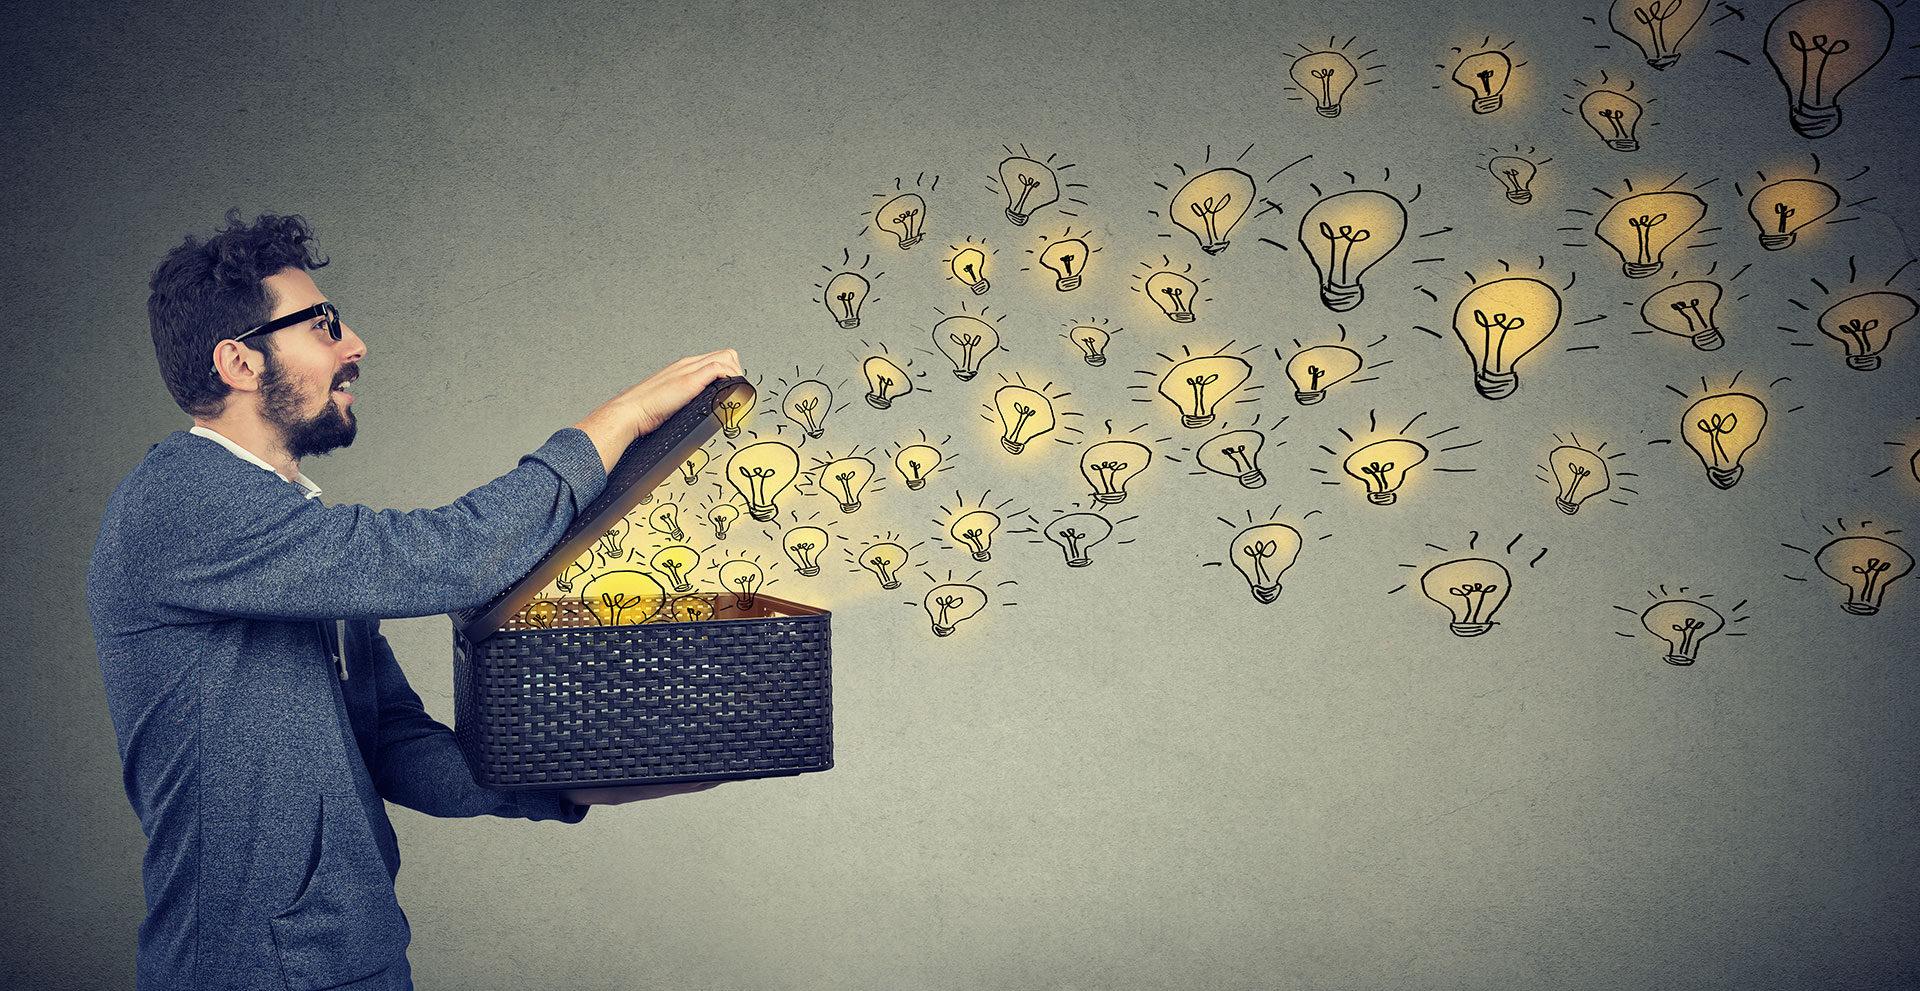 proteggere un'idea commerciale